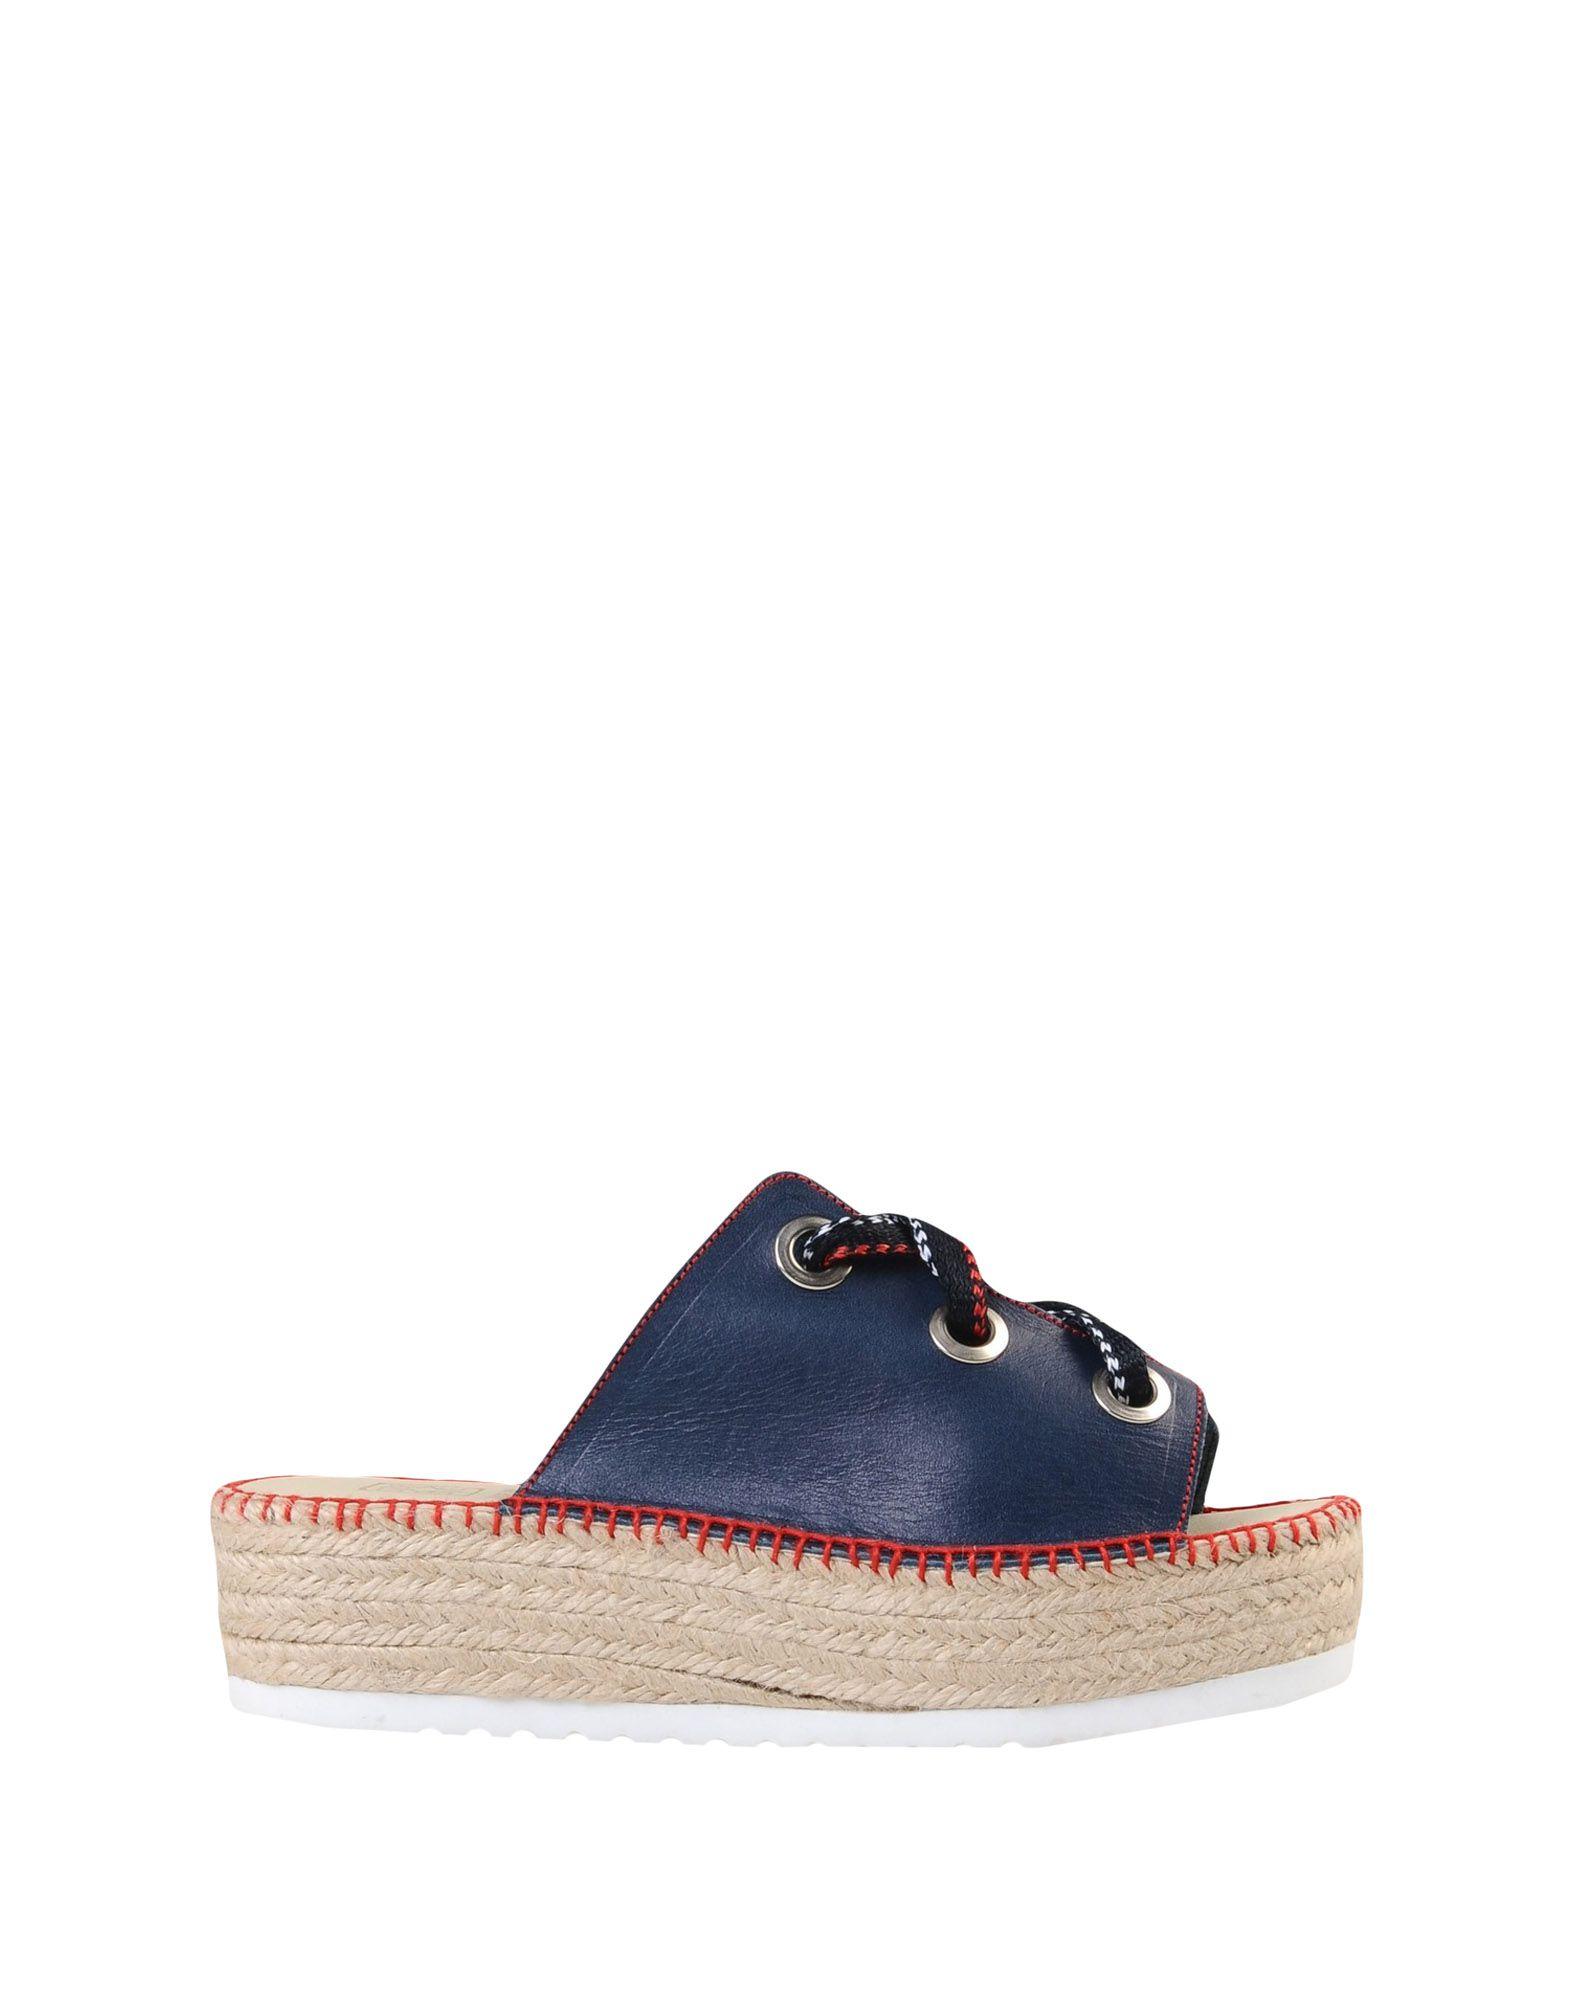 Star Love Zueco Vaquetilla  11451748US Gute Qualität beliebte Schuhe